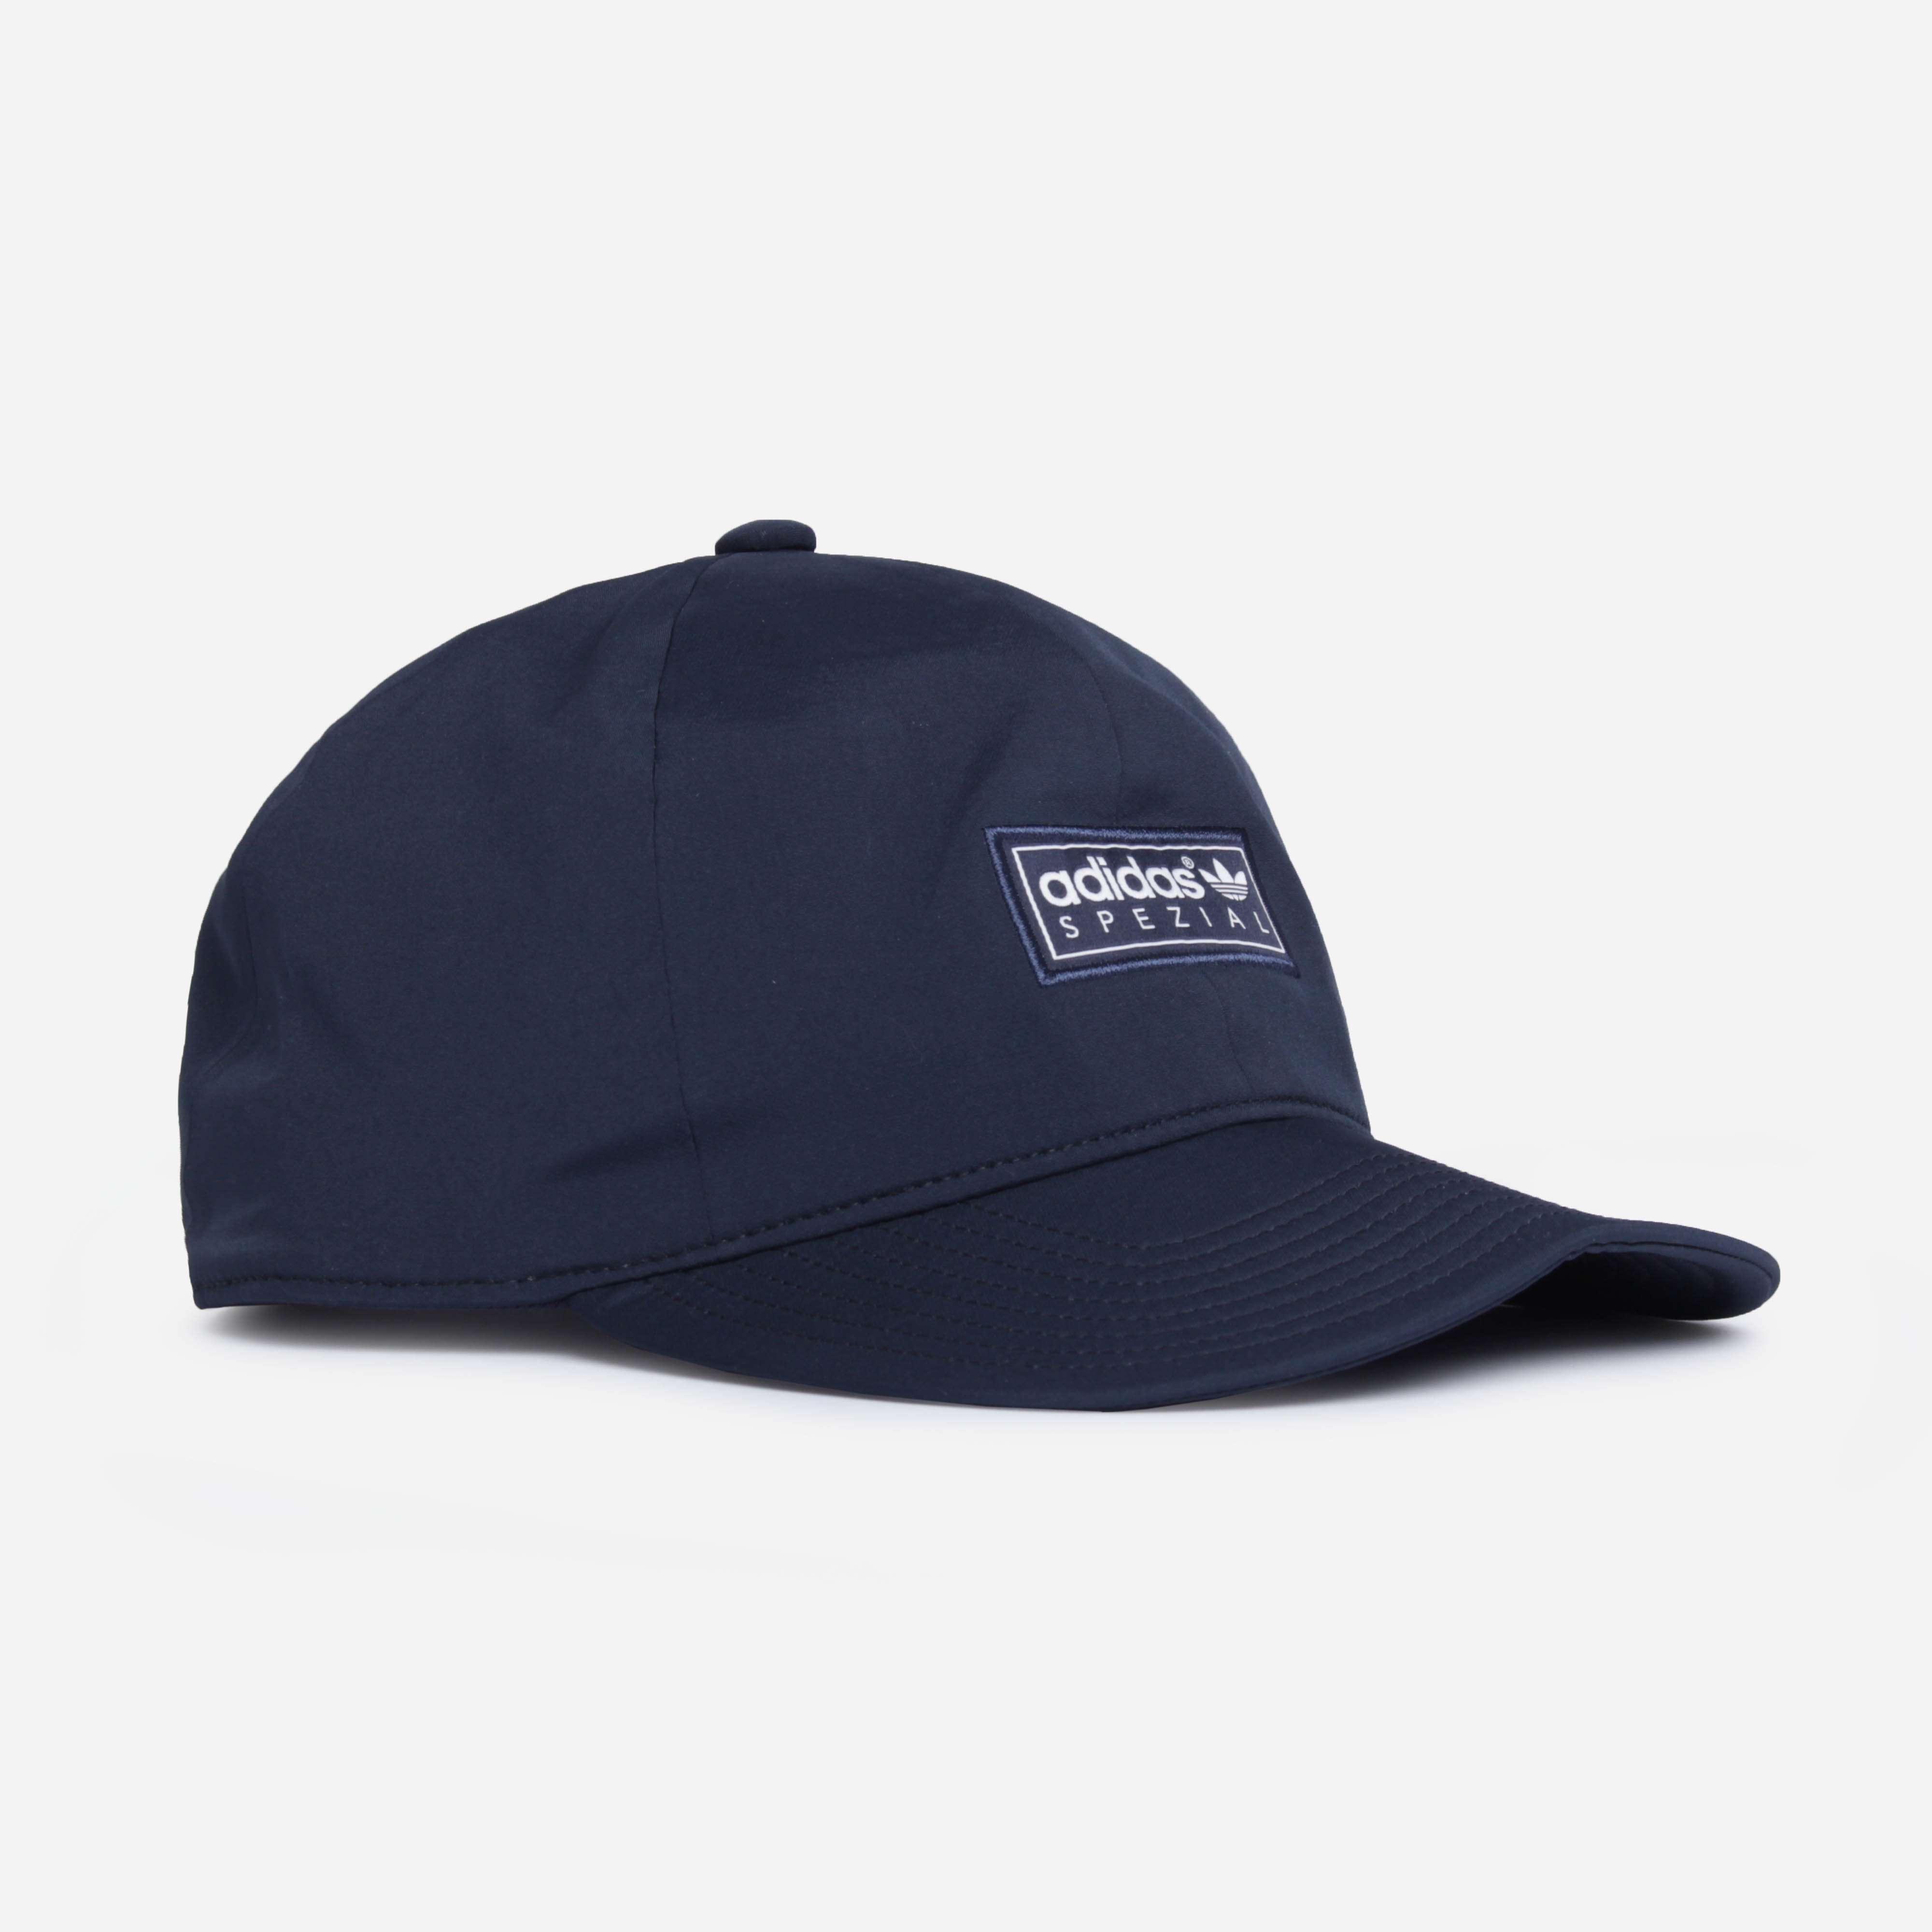 adidas Originals Spezial DW6711 BASEBALL CAP